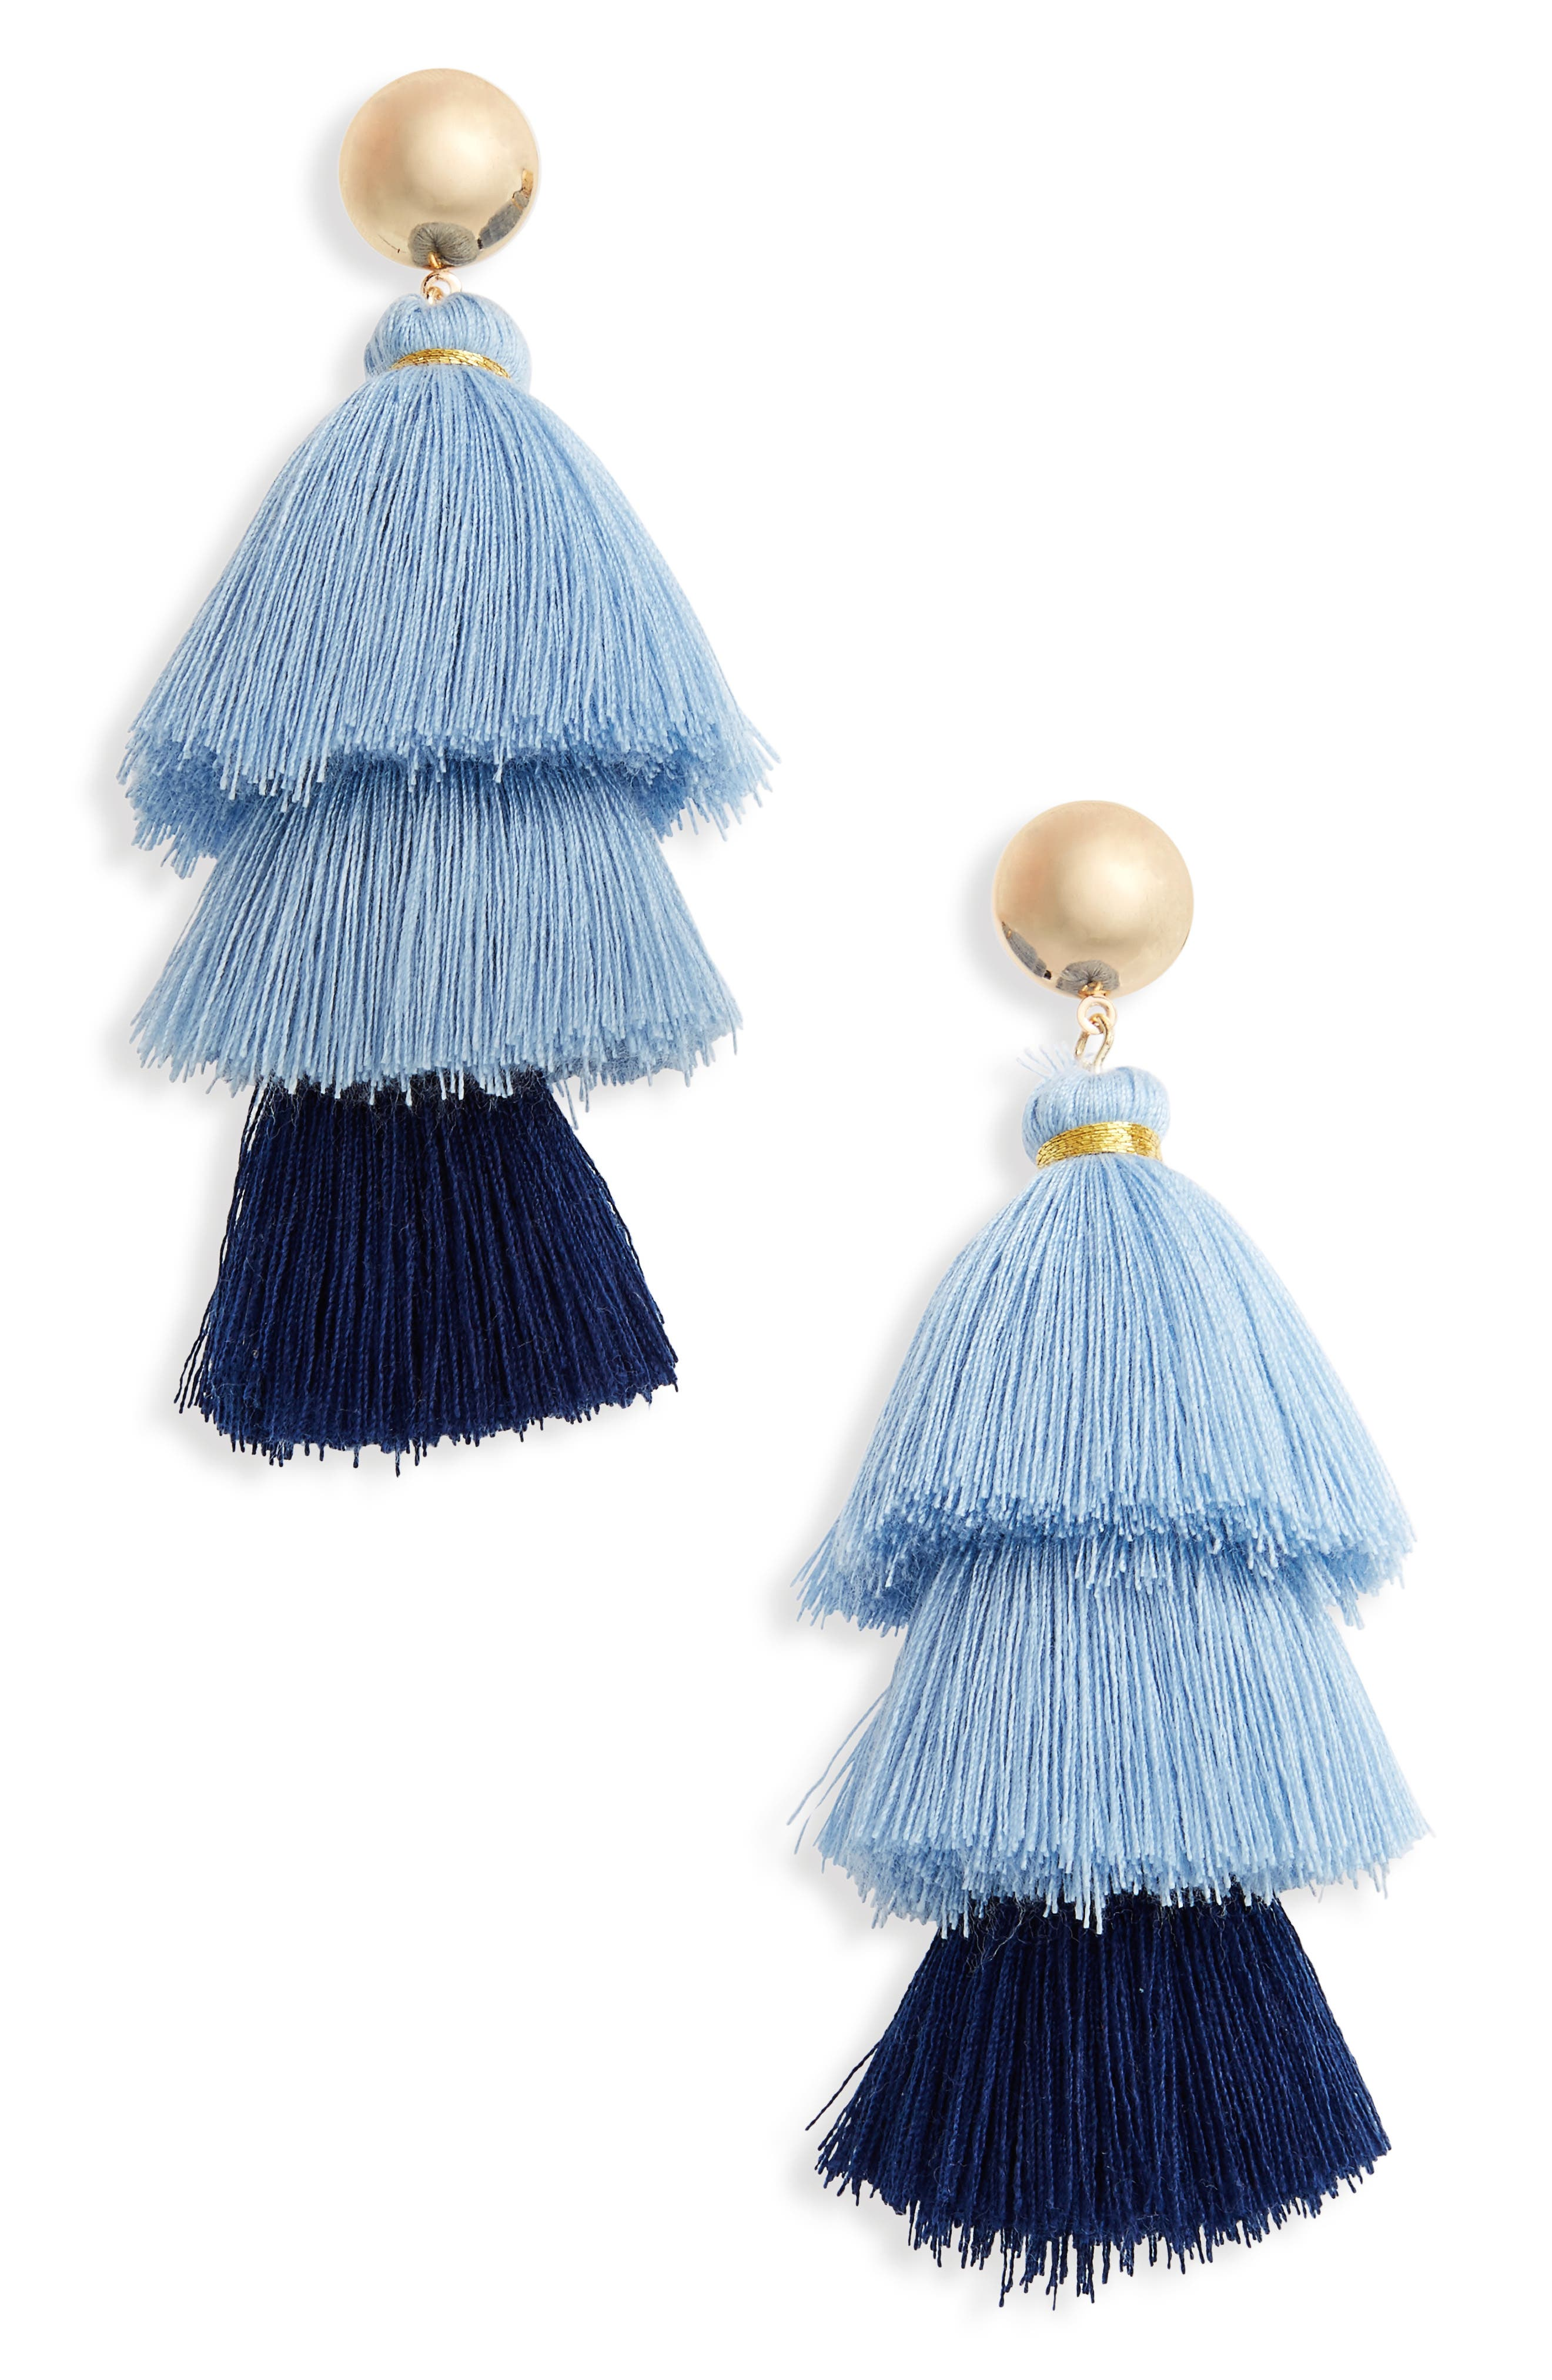 Multi Layer Tassel Earrings,                             Main thumbnail 1, color,                             Blue Multi